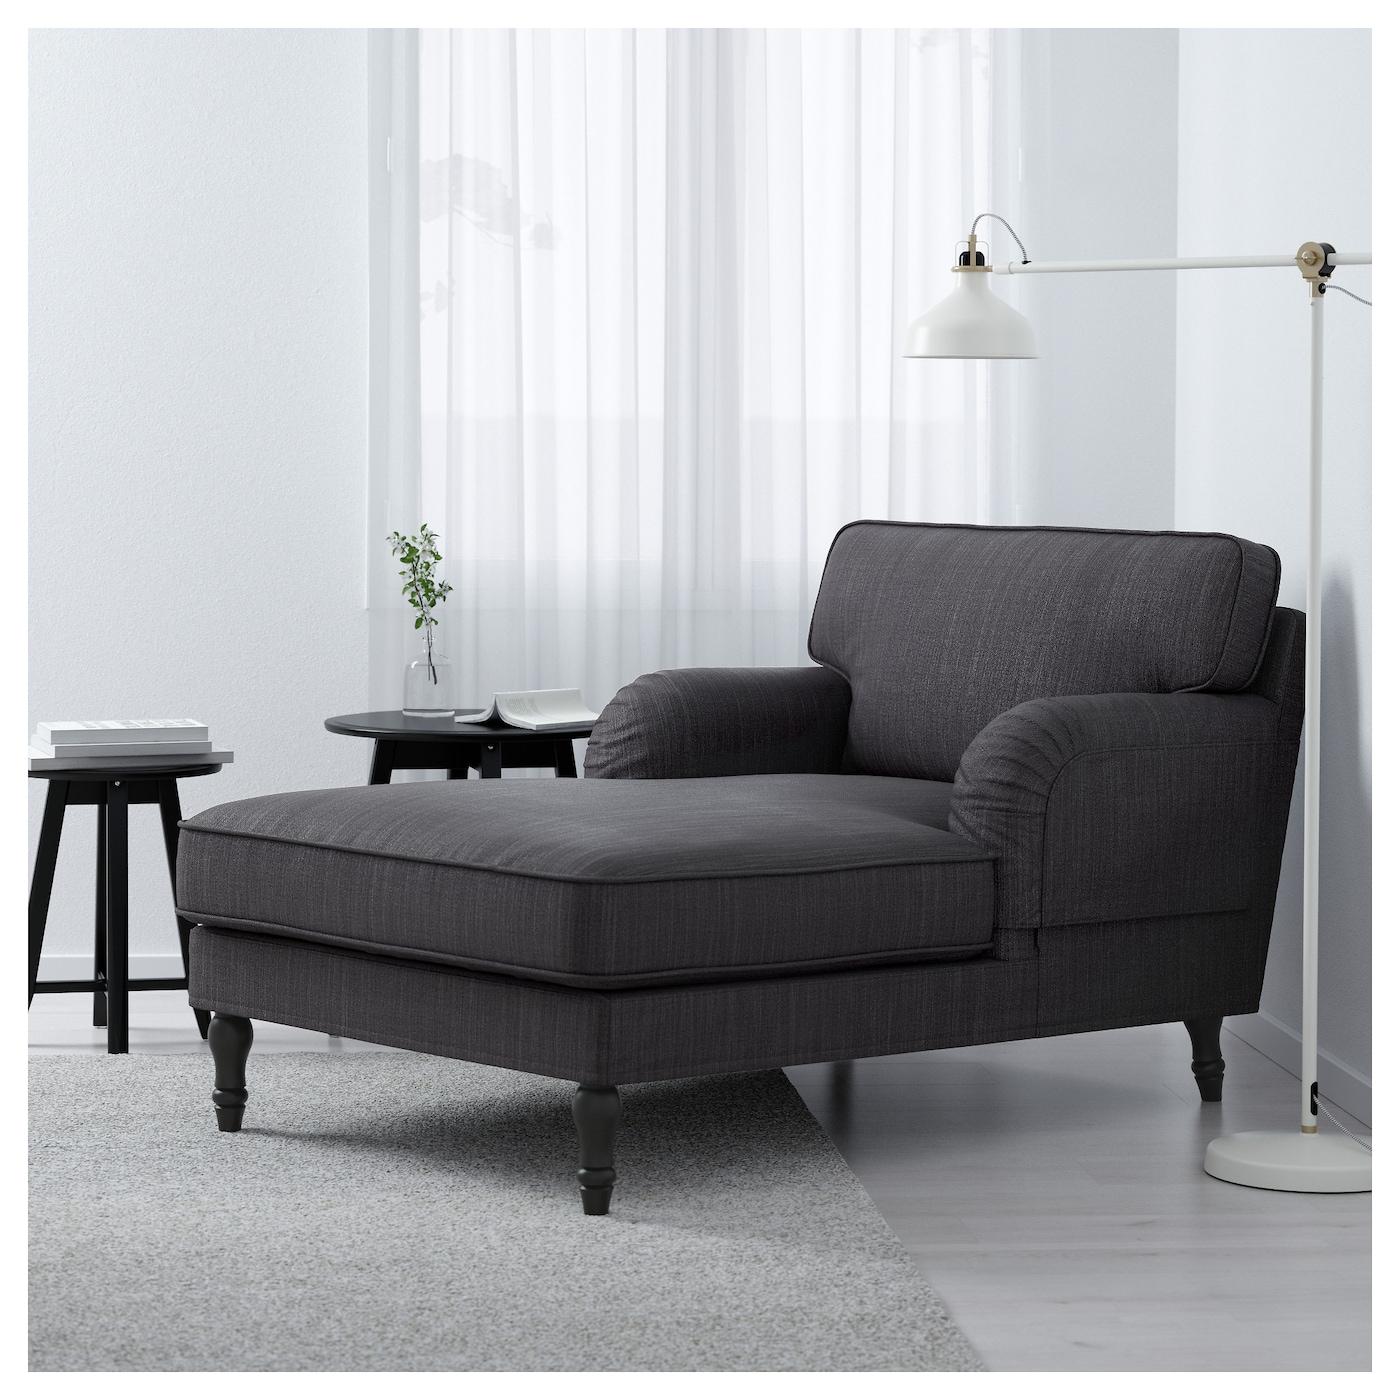 stocksund chaise longue nolhaga dark grey black wood ikea. Black Bedroom Furniture Sets. Home Design Ideas